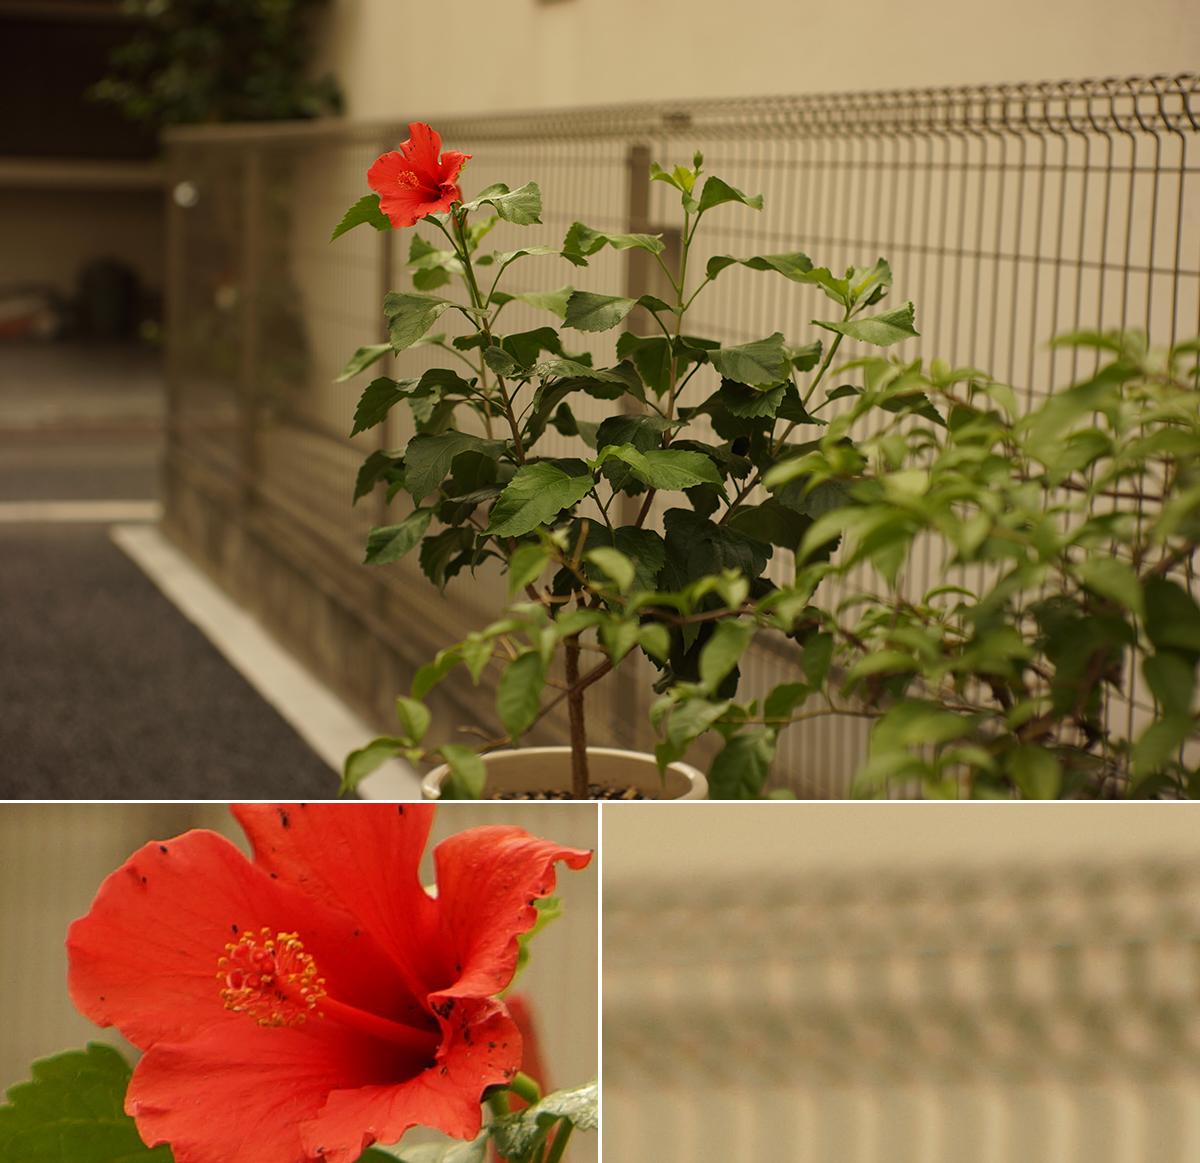 50mm_006_002_4988